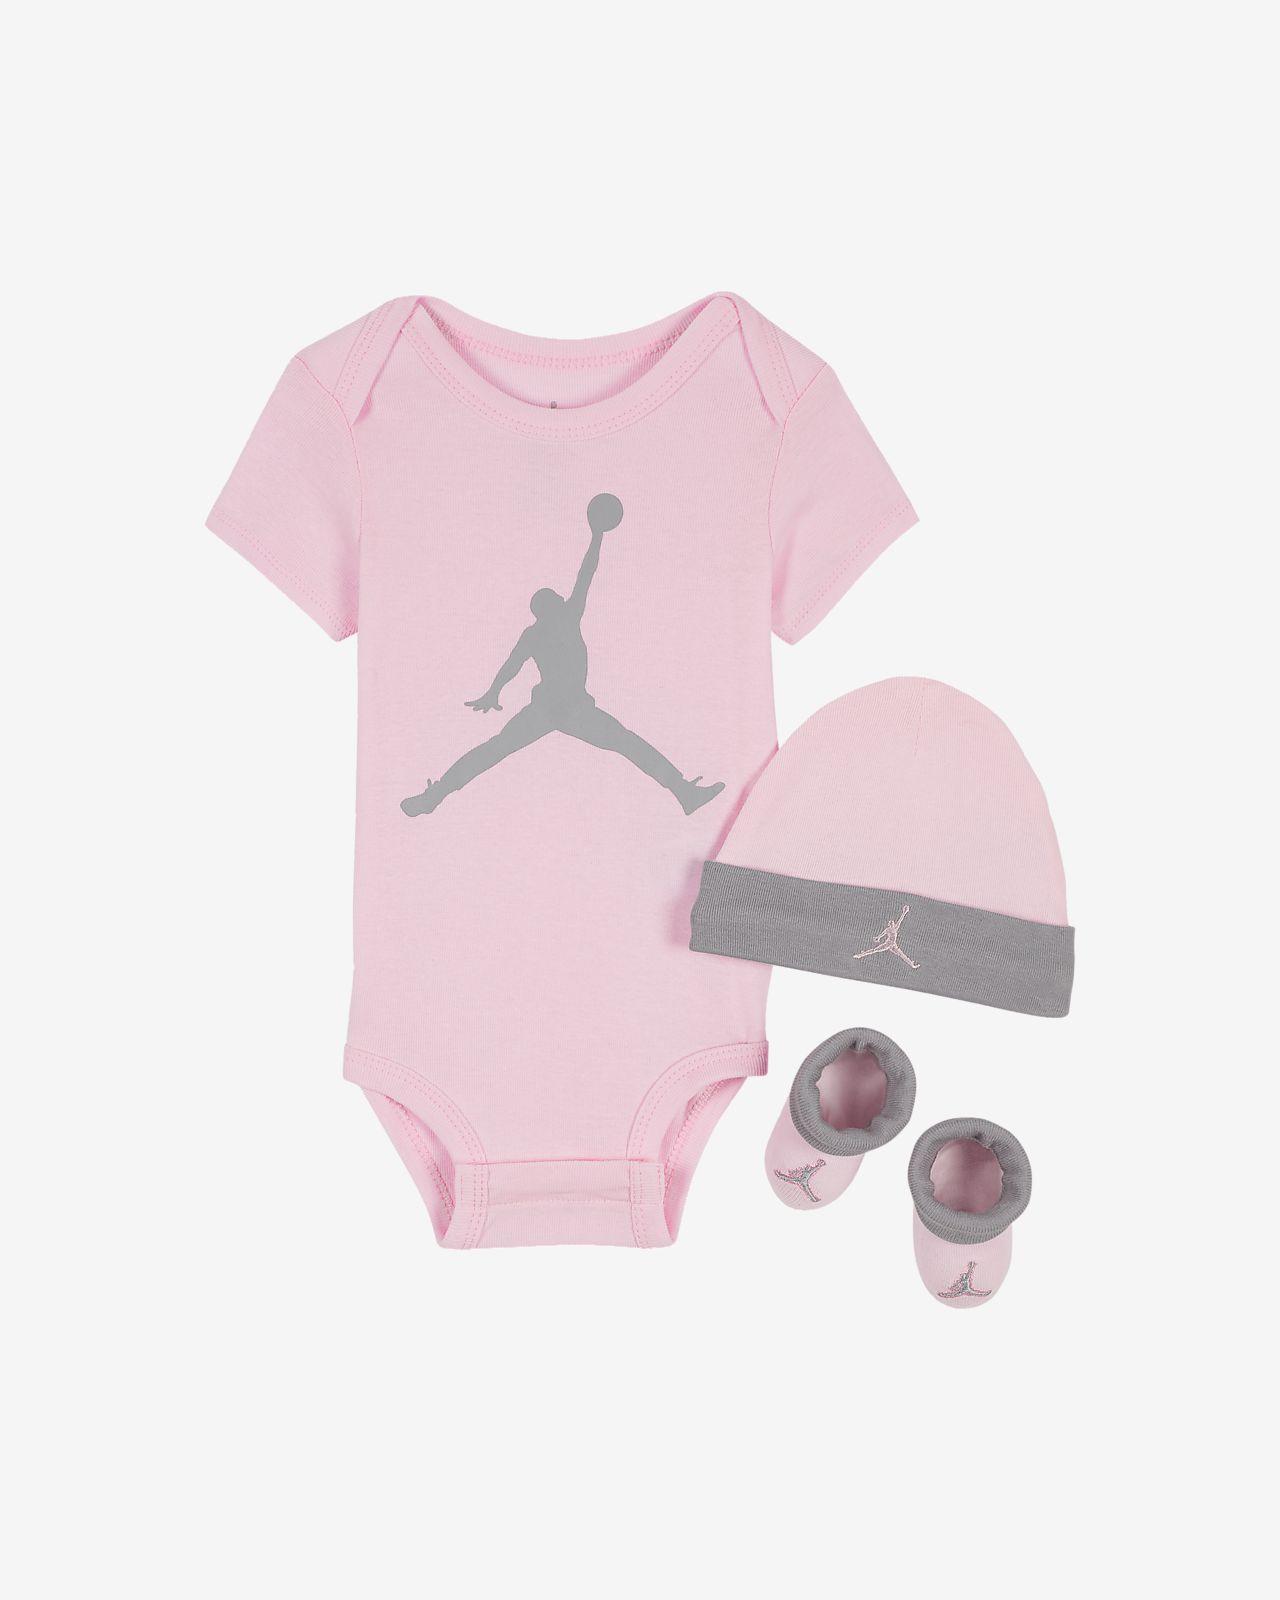 09f22aeb7 Jordan Infant 3-Piece Set. Nike.com